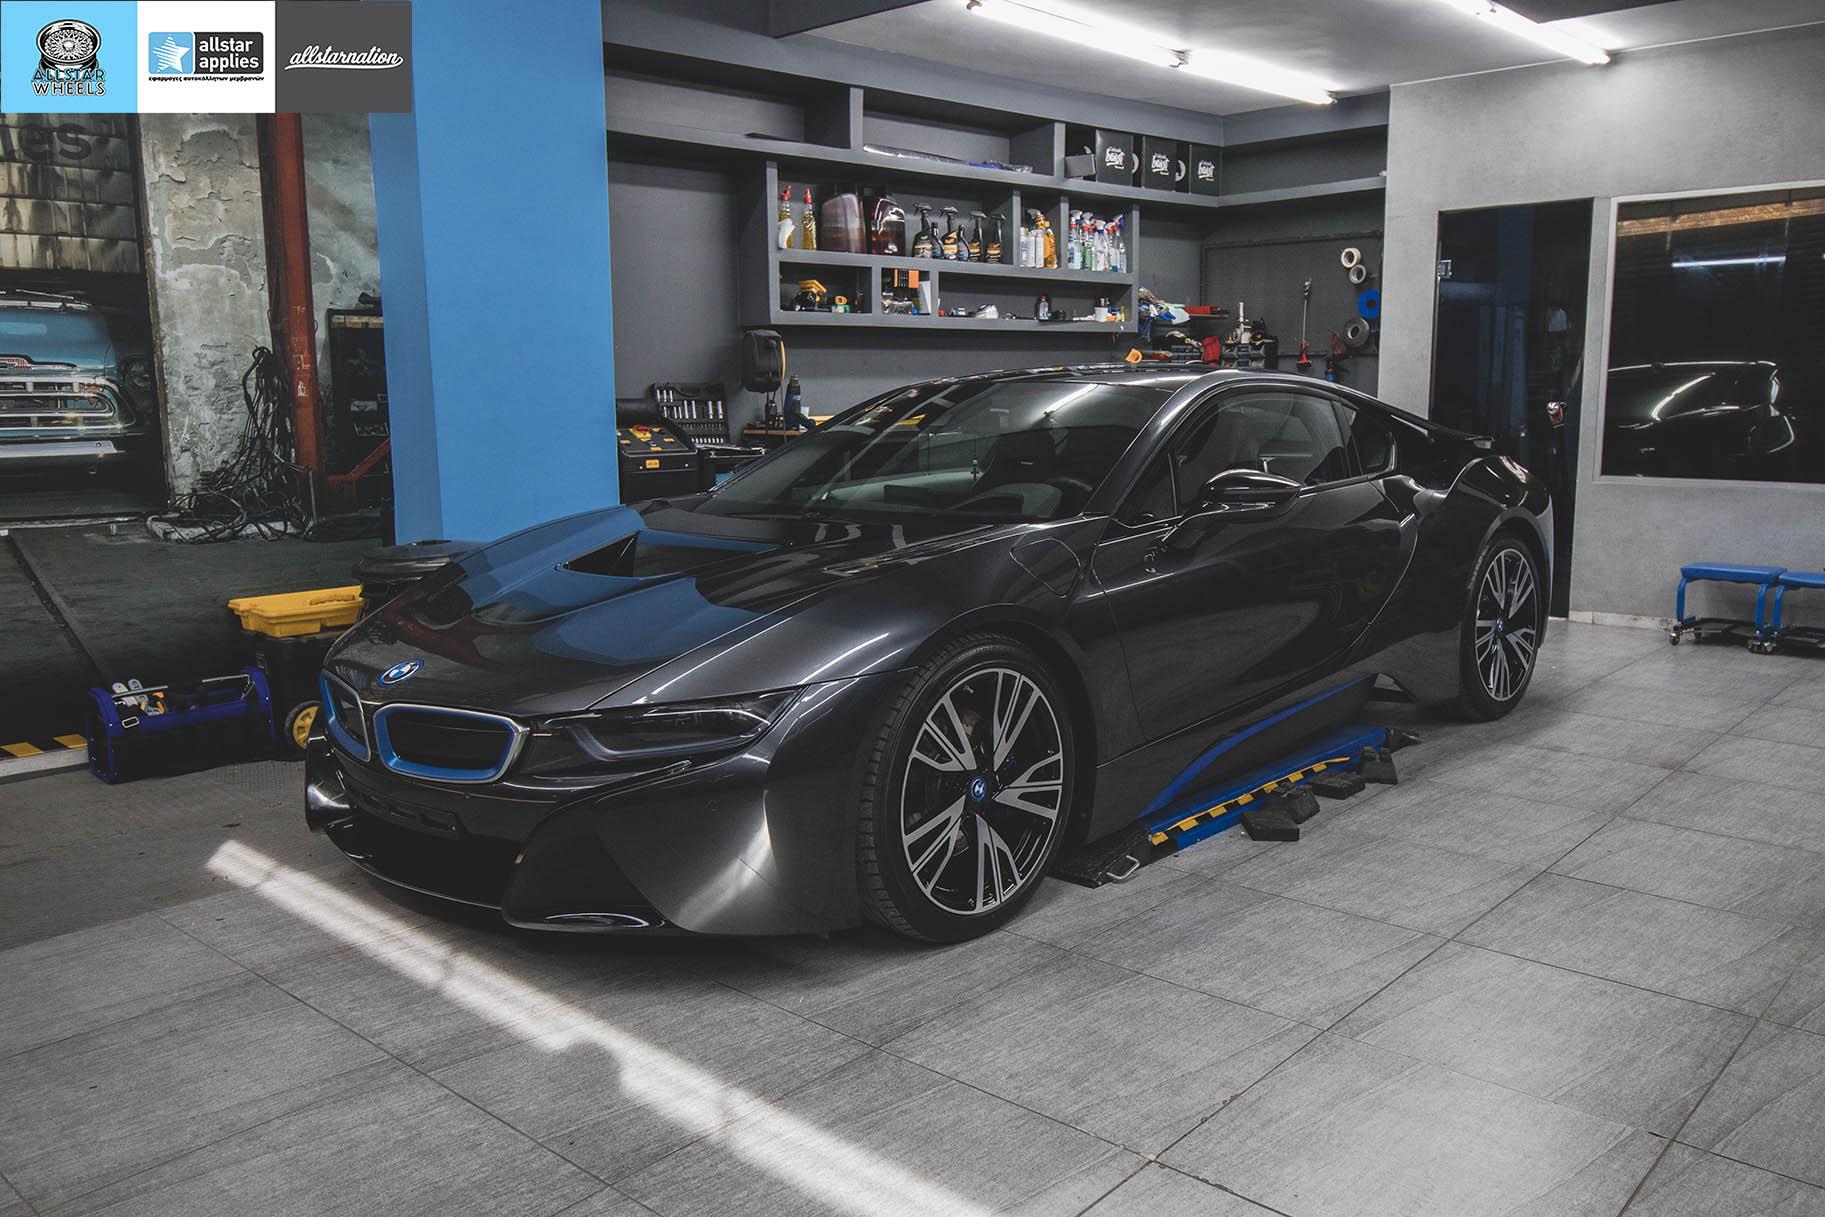 BMW I8 – Μεμβράνες προστασίας χρώματος – Μπροστινό πακέτο (9)